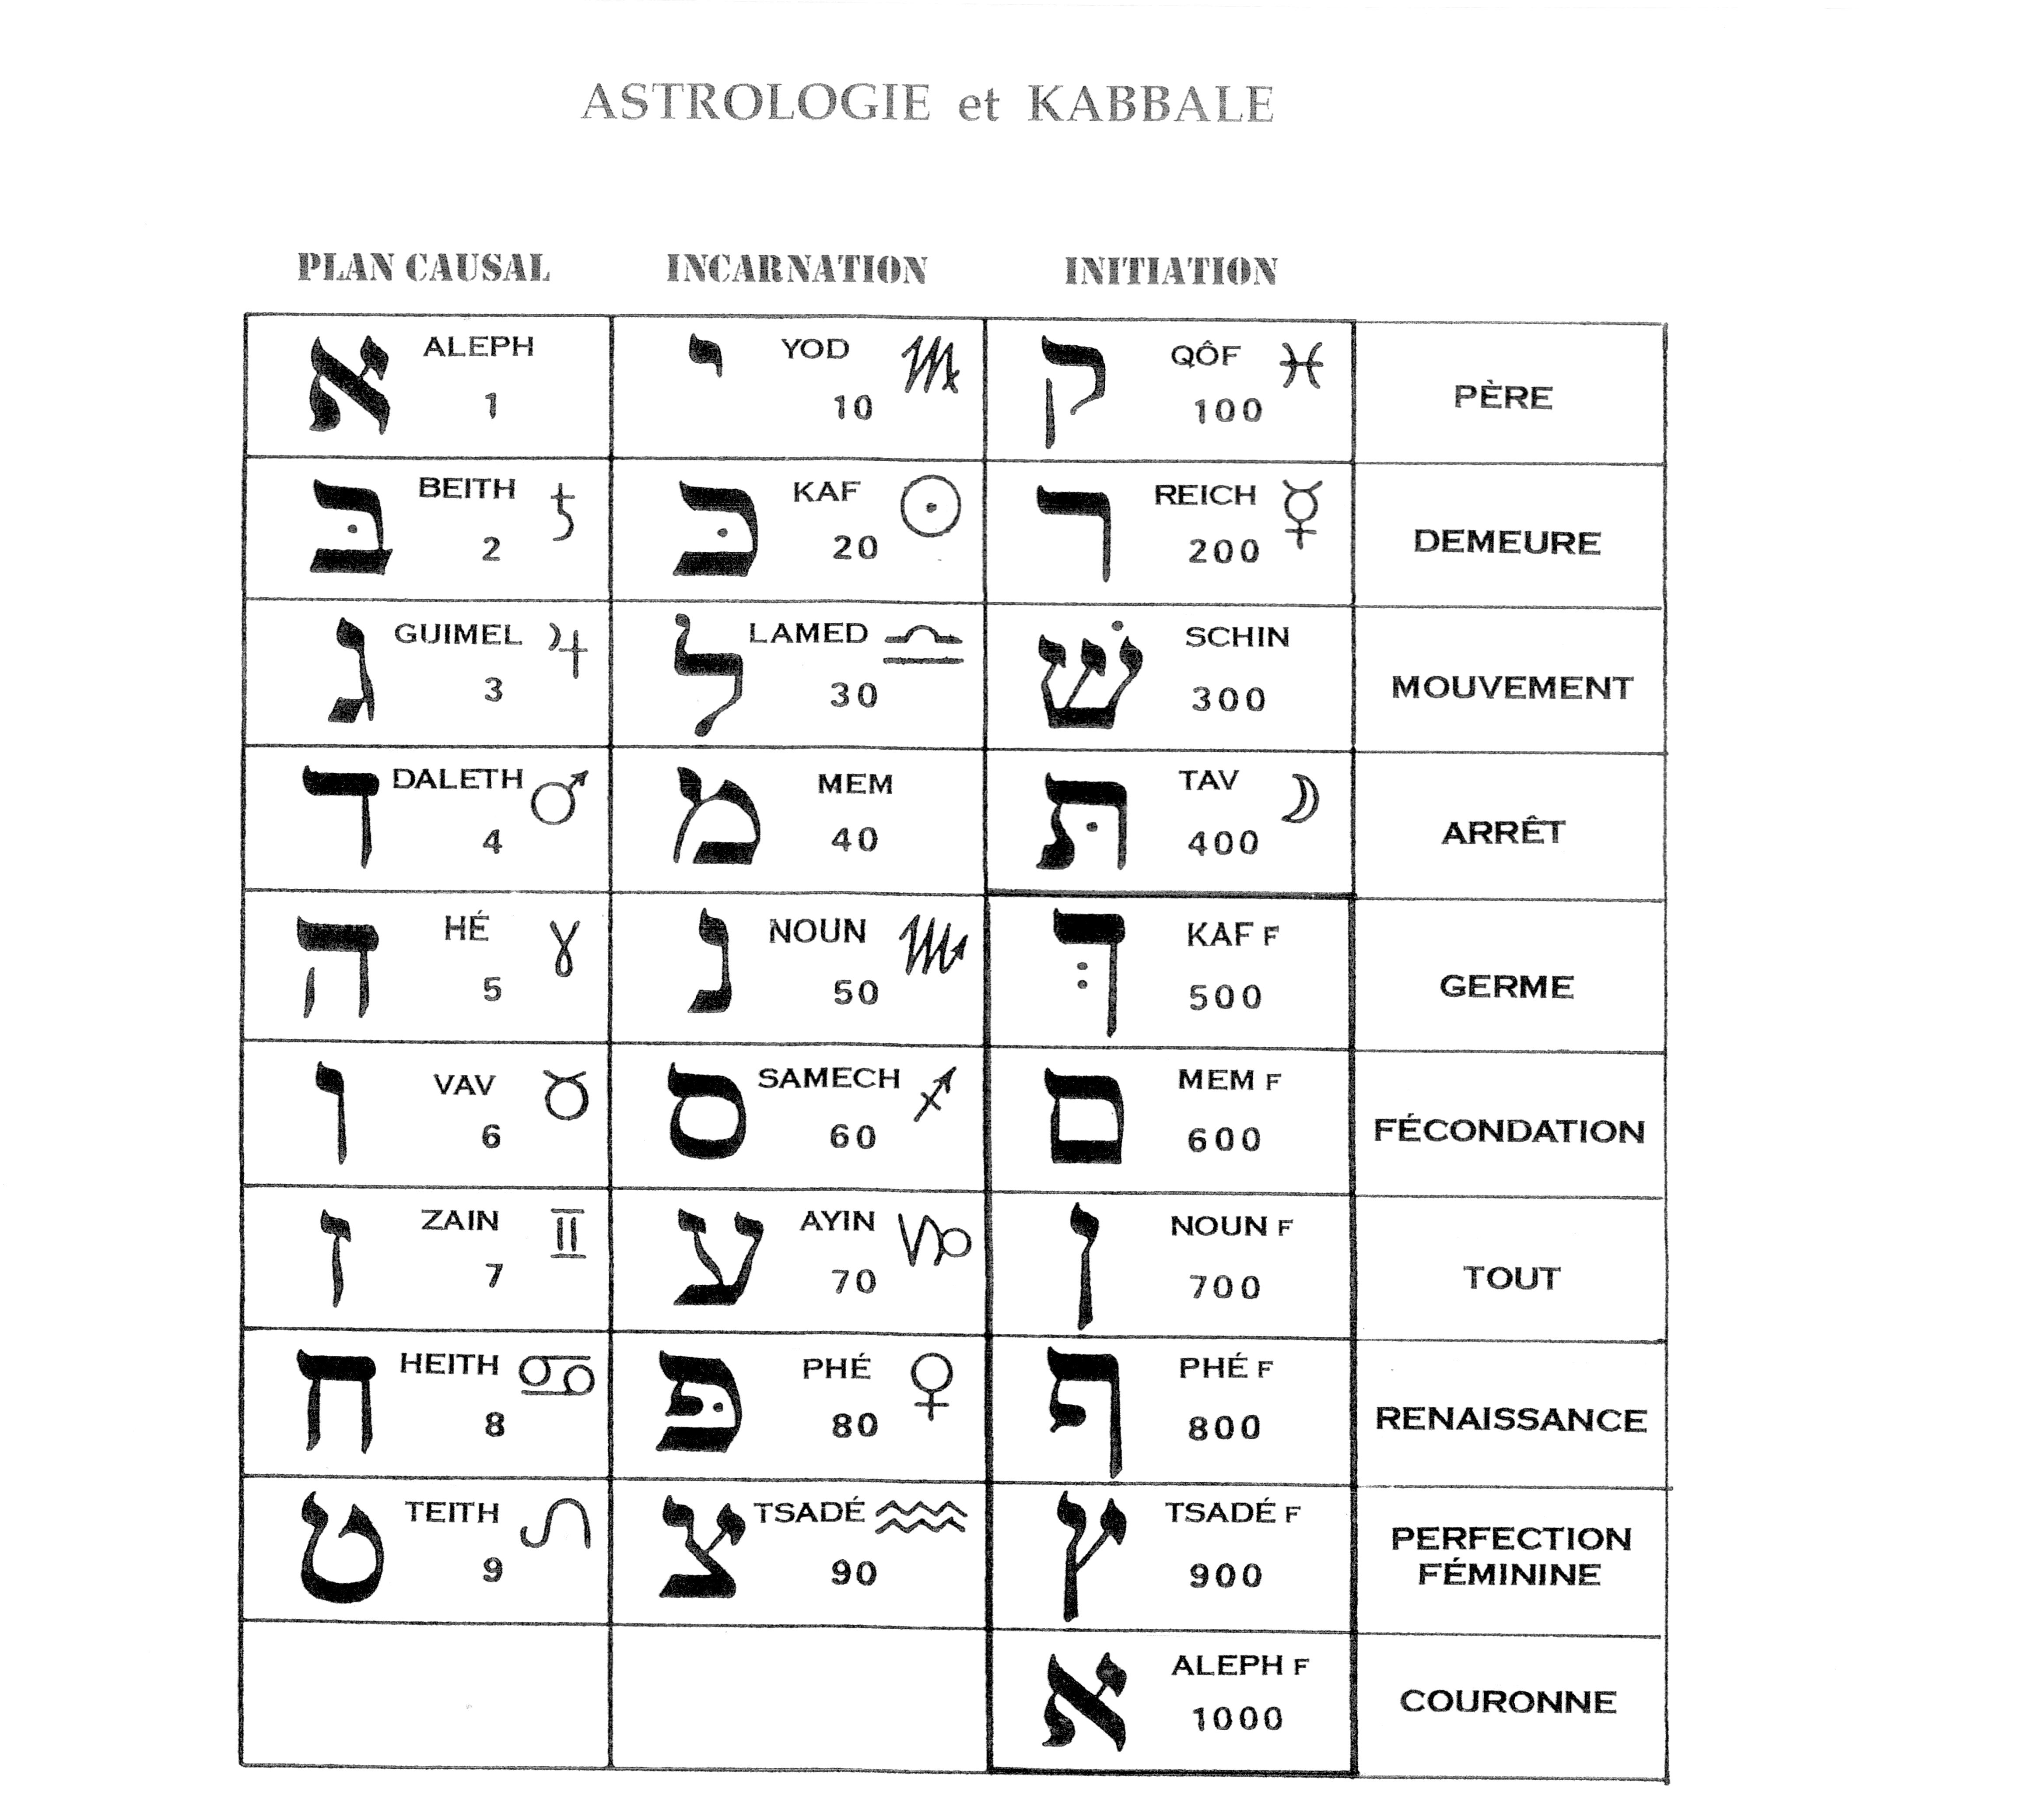 astrologie et kabbale